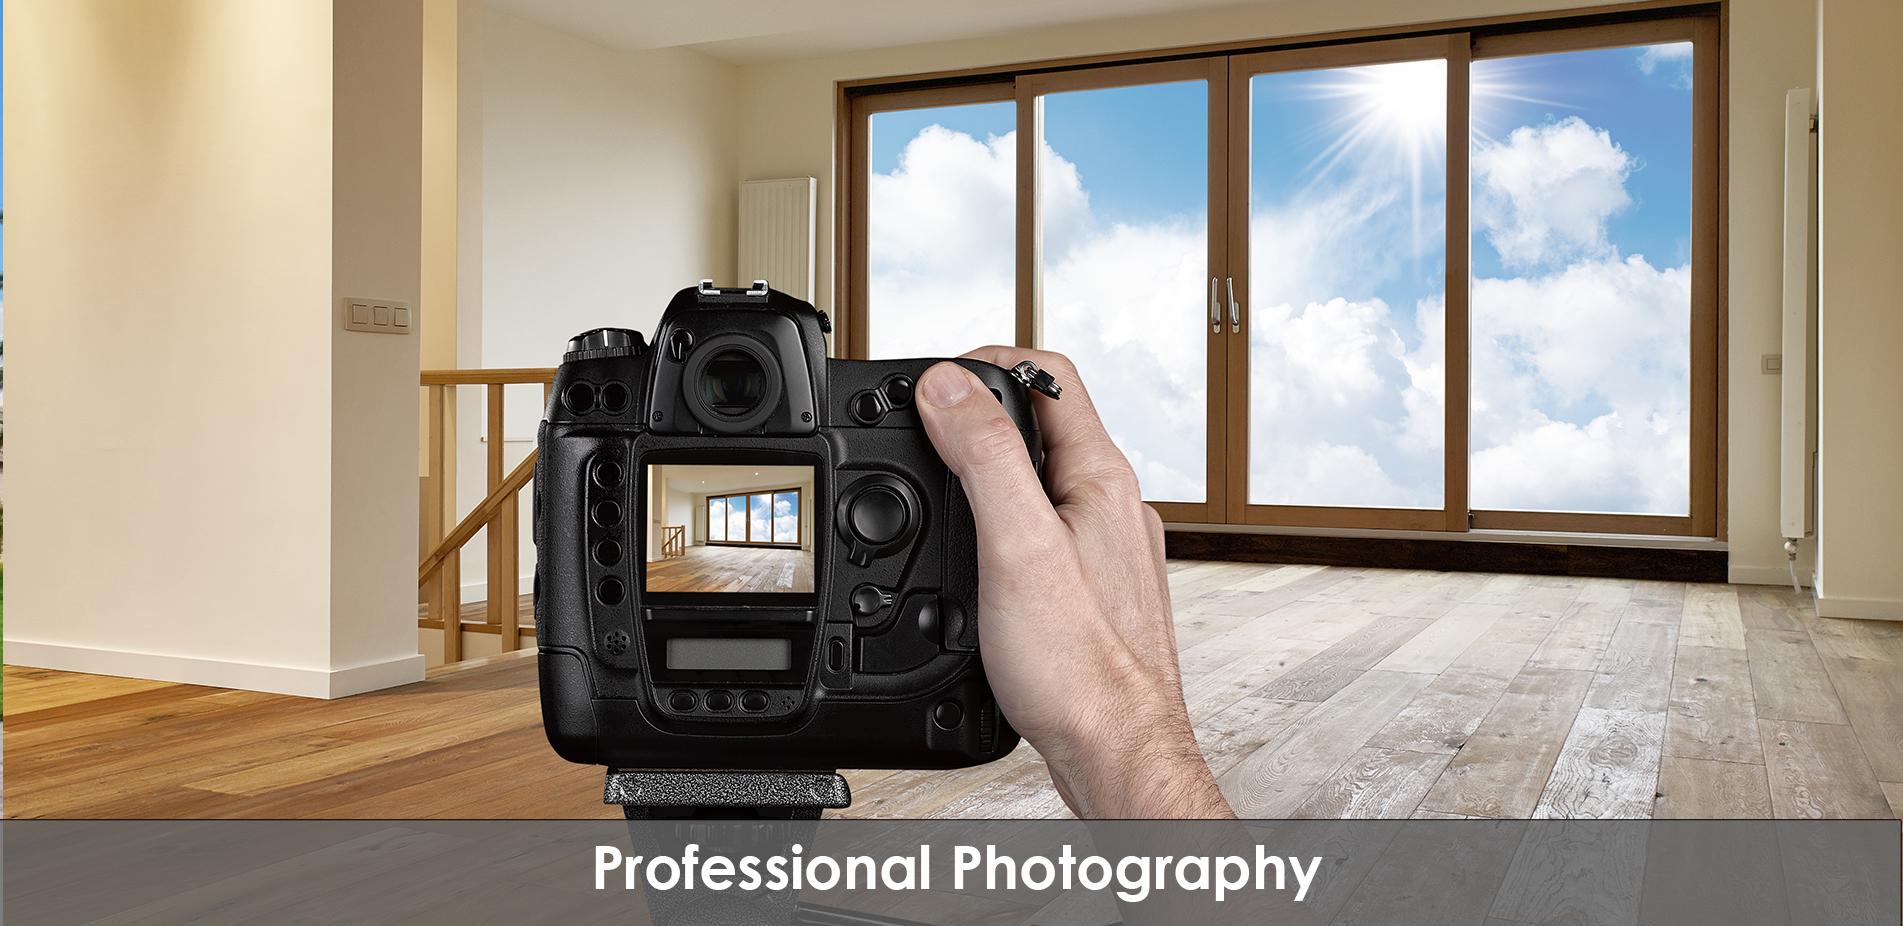 Professional Photography.jpg